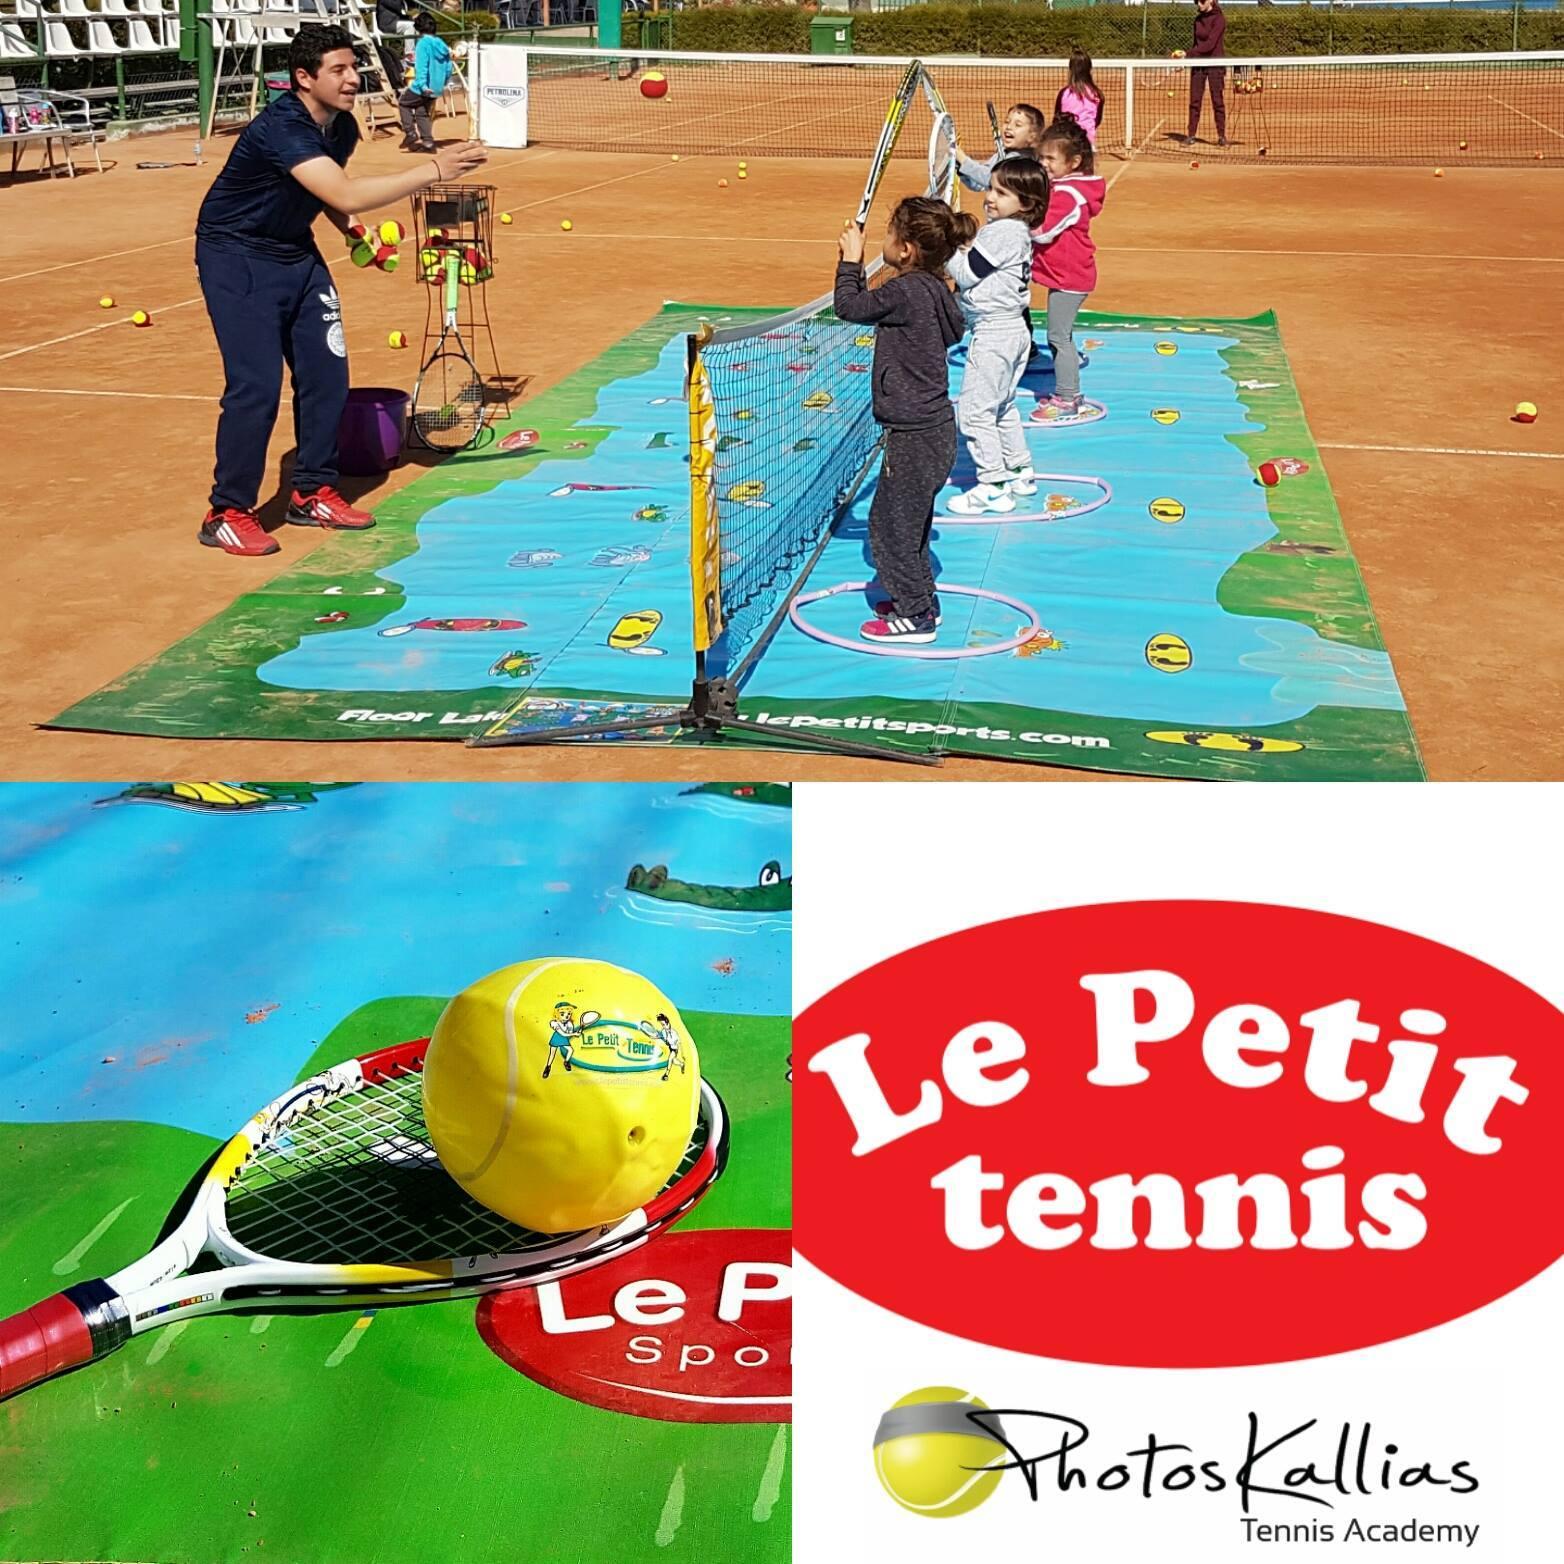 Petite tennis at photos kallias tennis academy